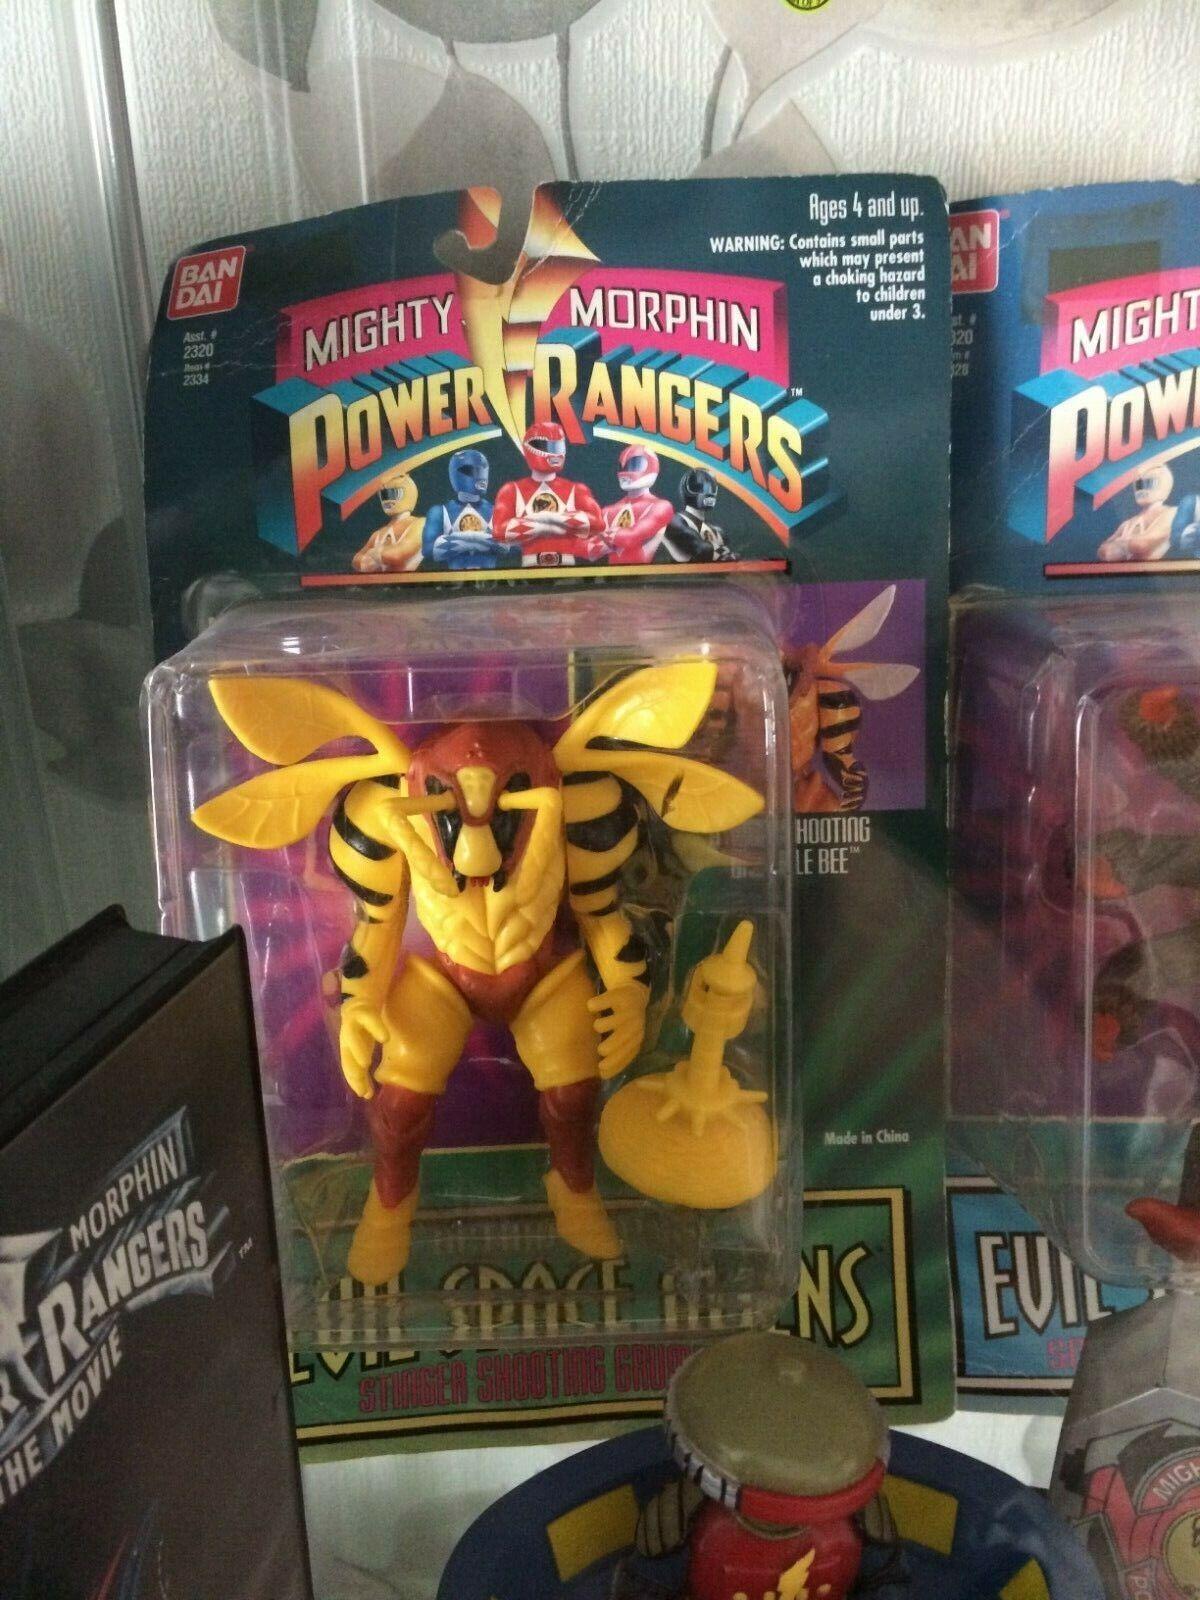 Mighty morphin power rangers spidertron and grumblebee figures mint original vin